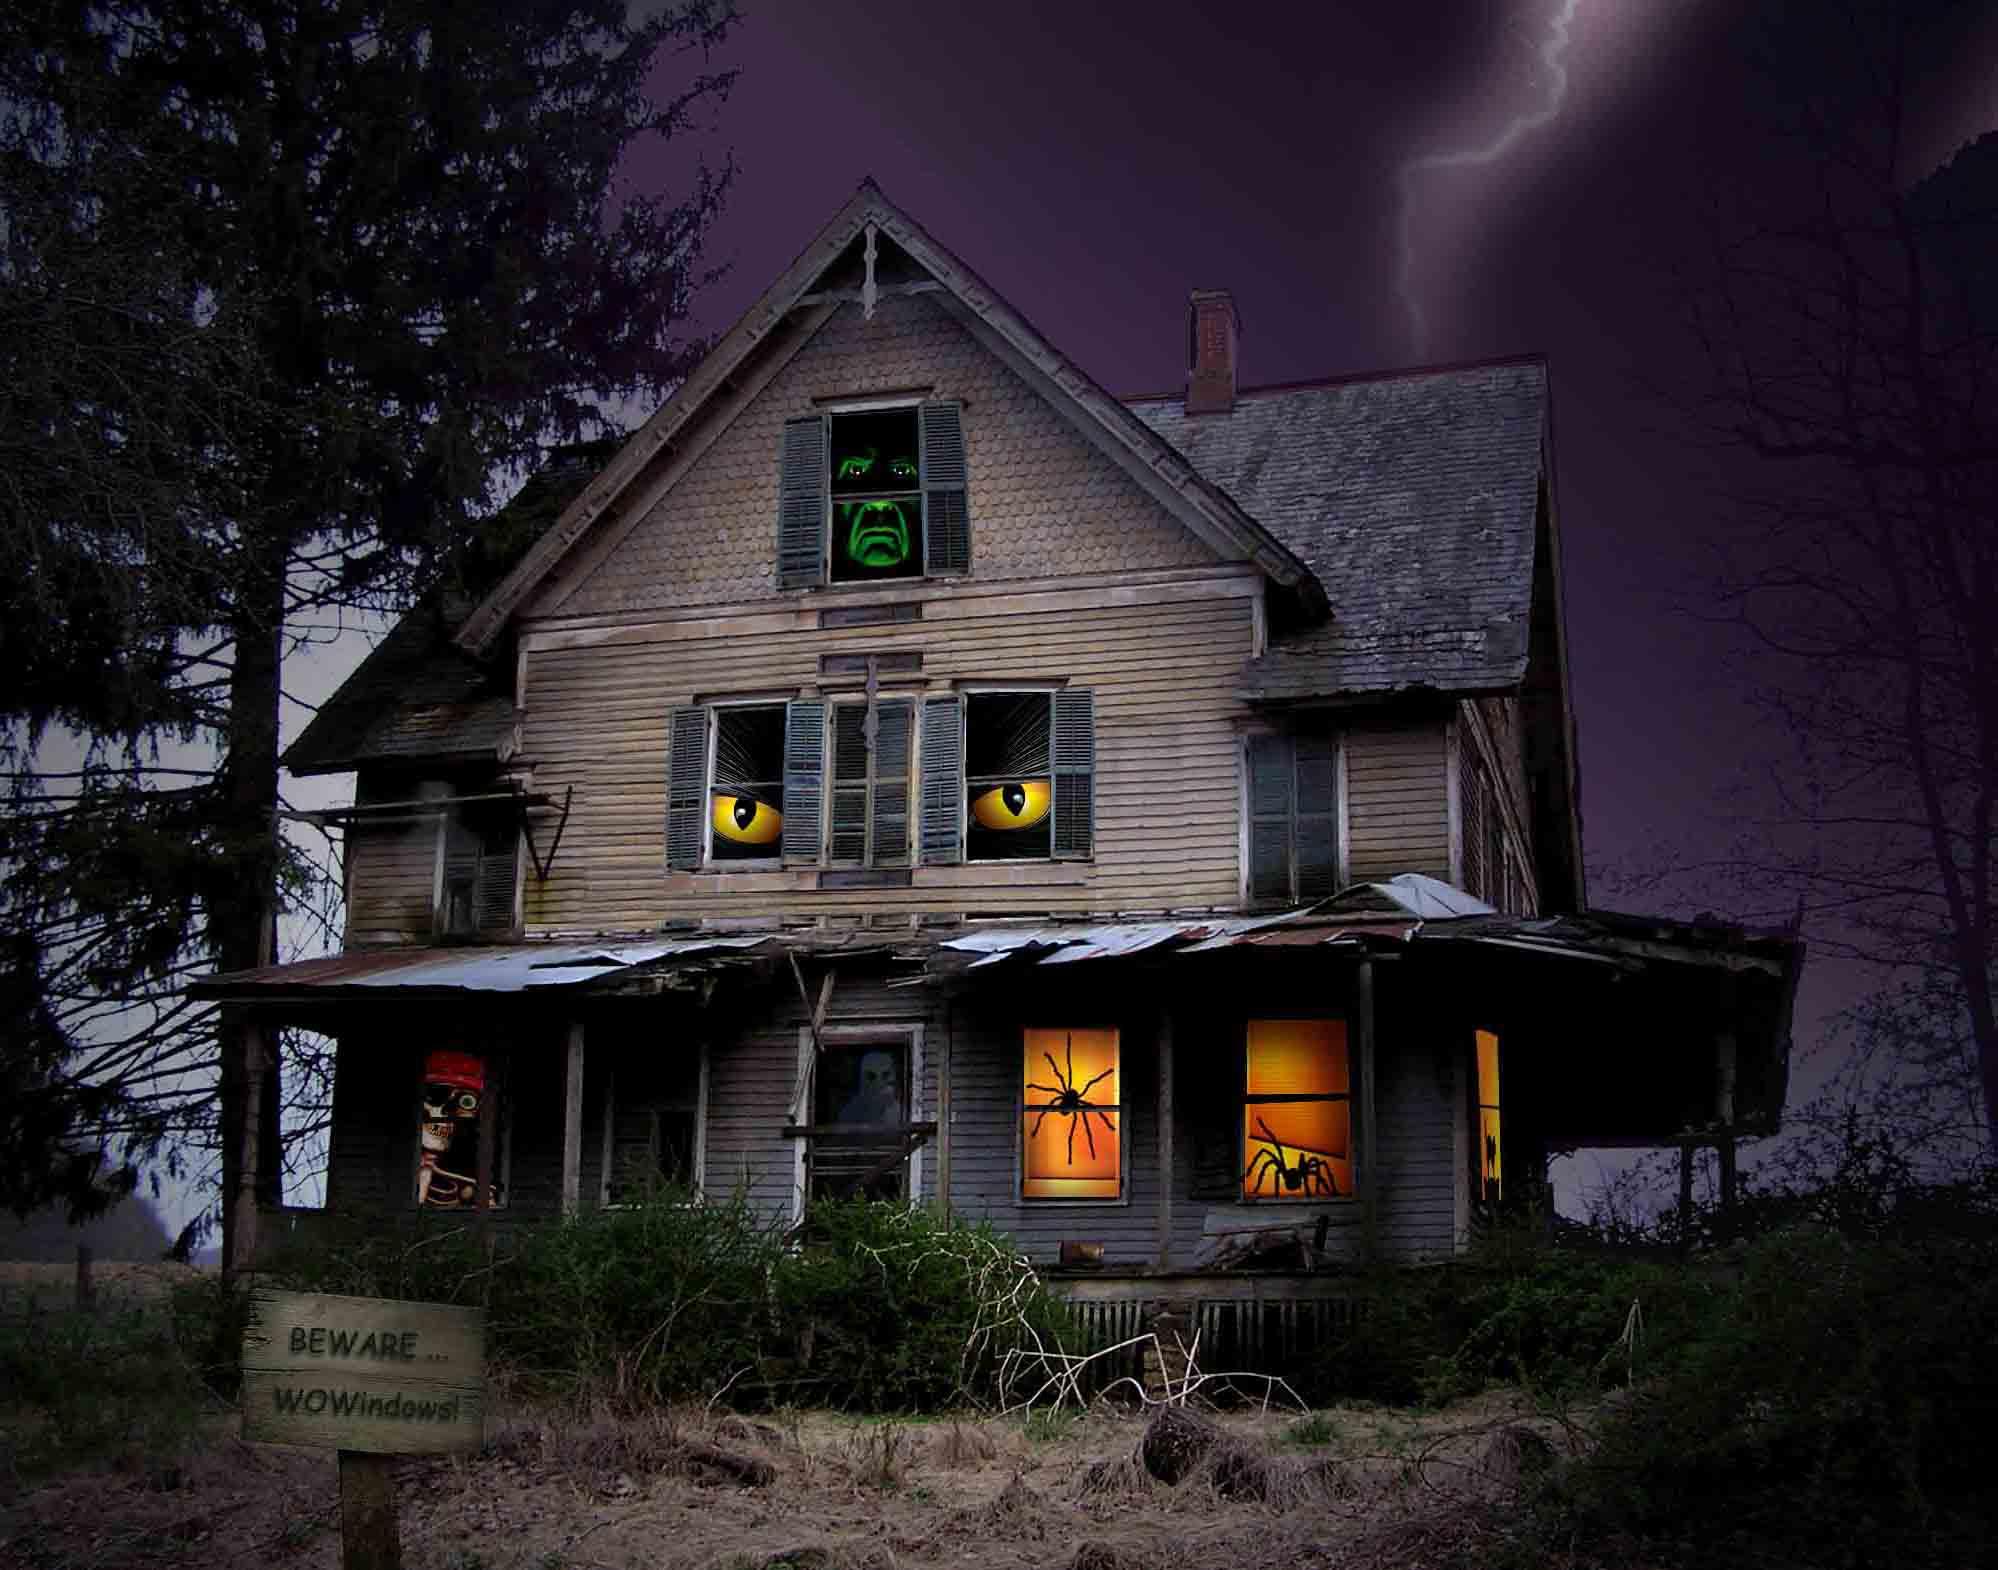 Scary Halloween Pumpkin 2012 Haunted House HD Wallpaper 1998x1570